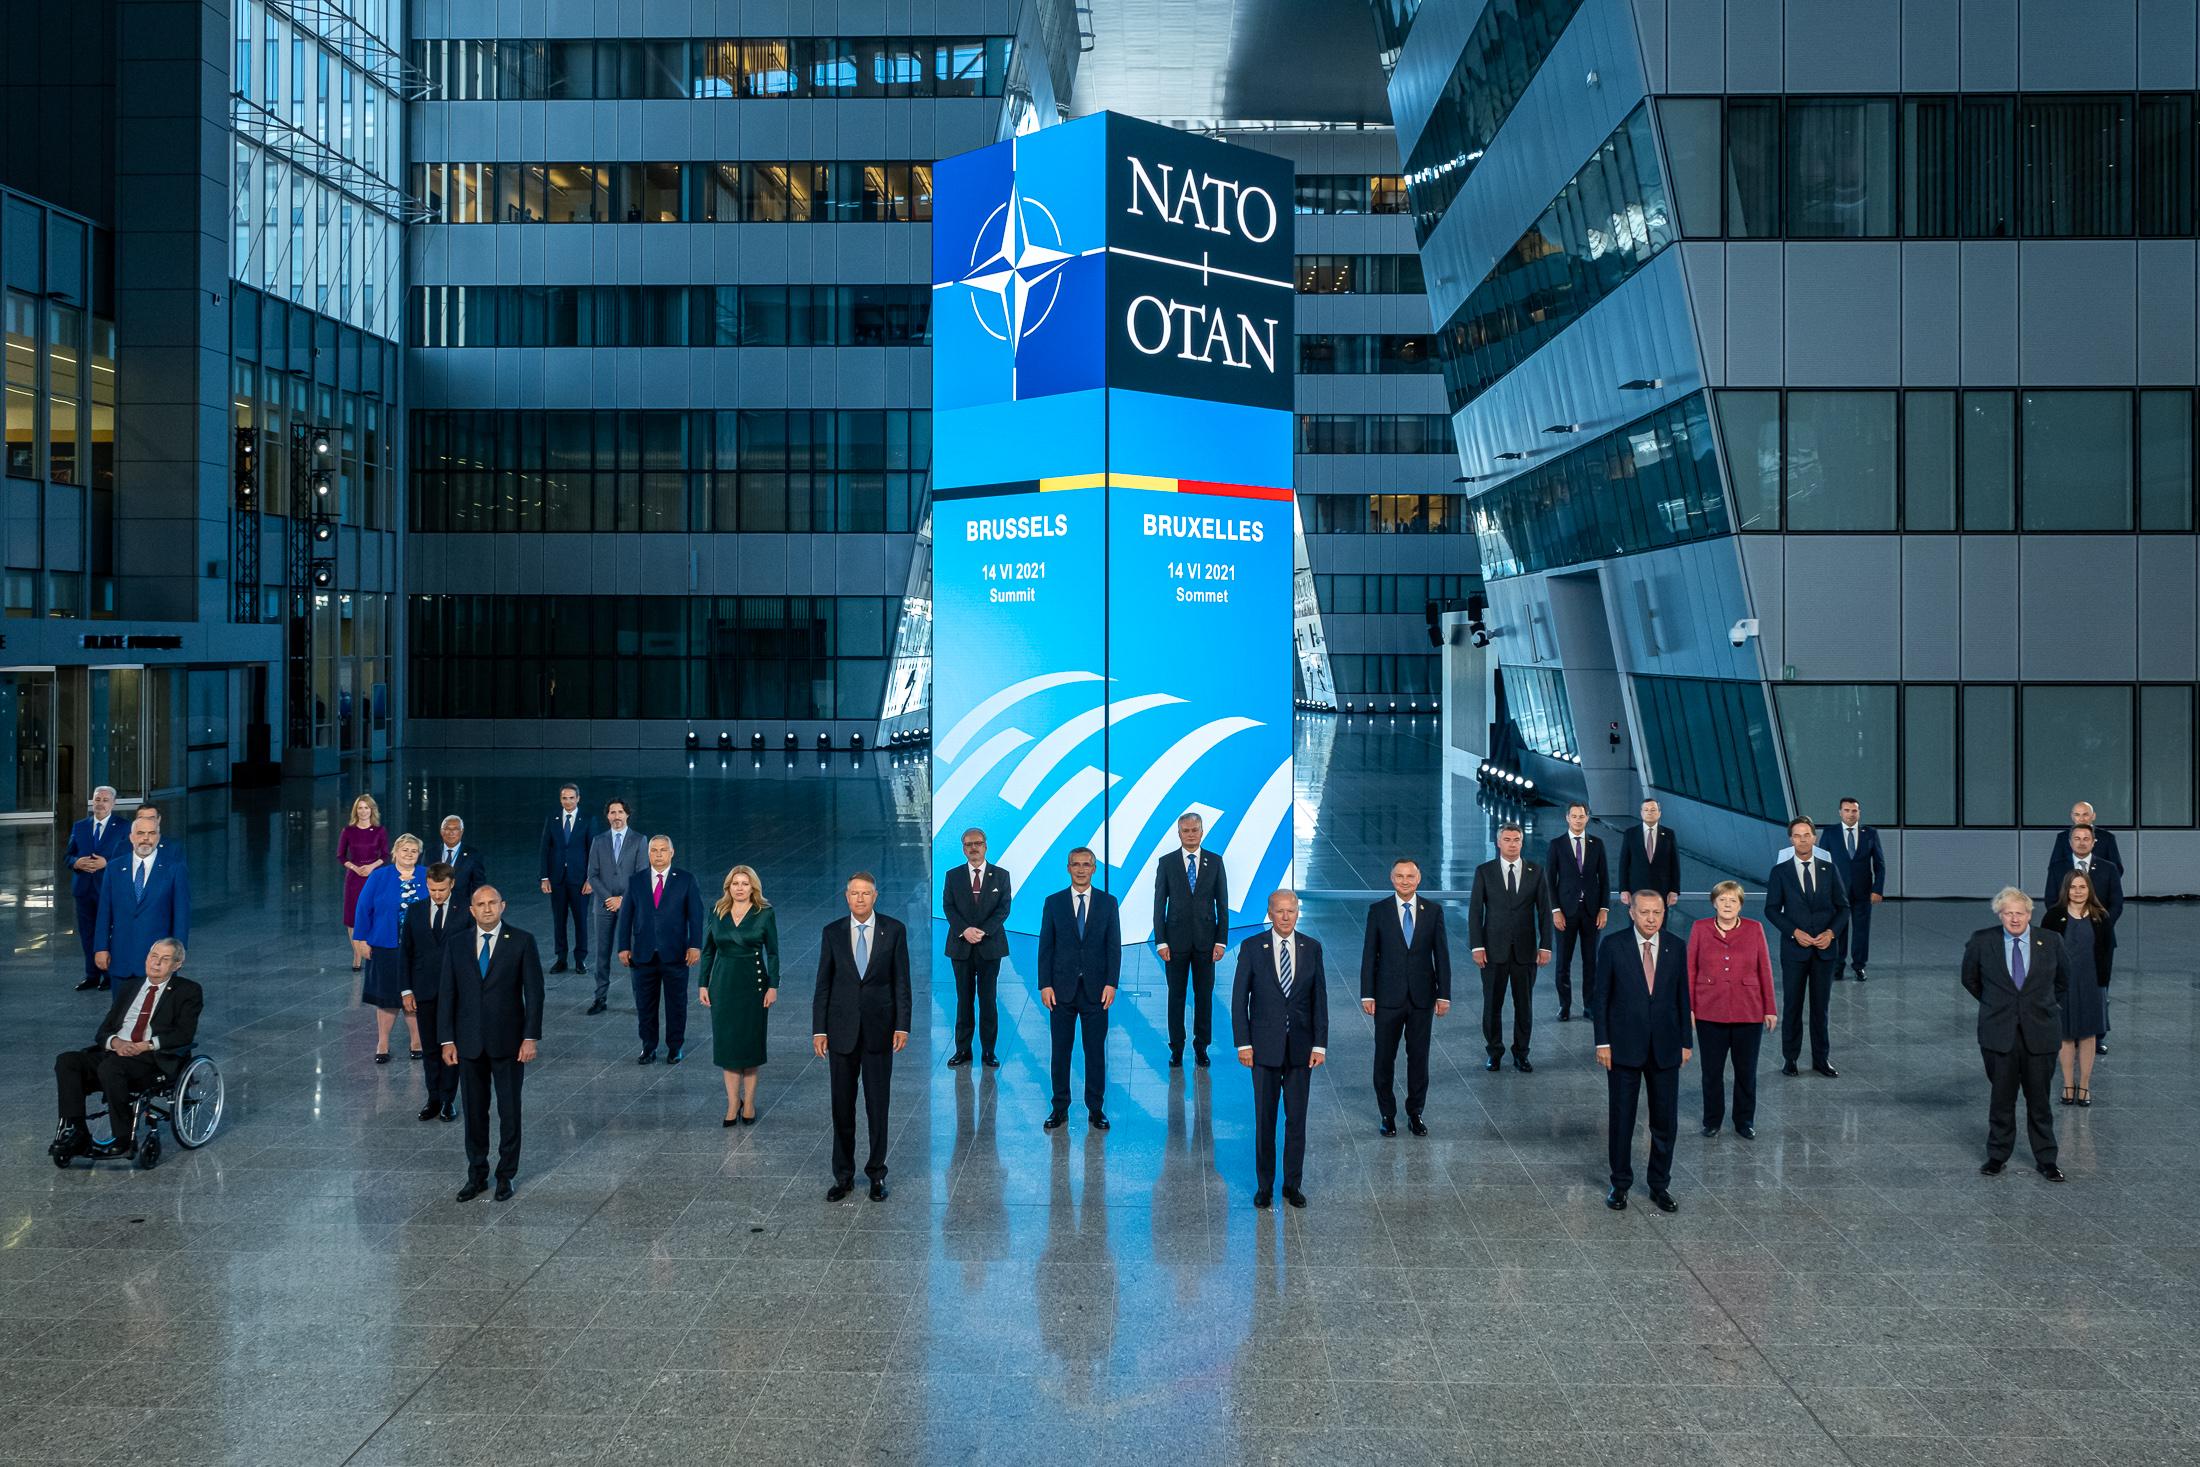 File:НАТО Самит 2021 NATO Summit 2021 -14.06.2021- (51246785858).jpg -  Wikimedia Commons